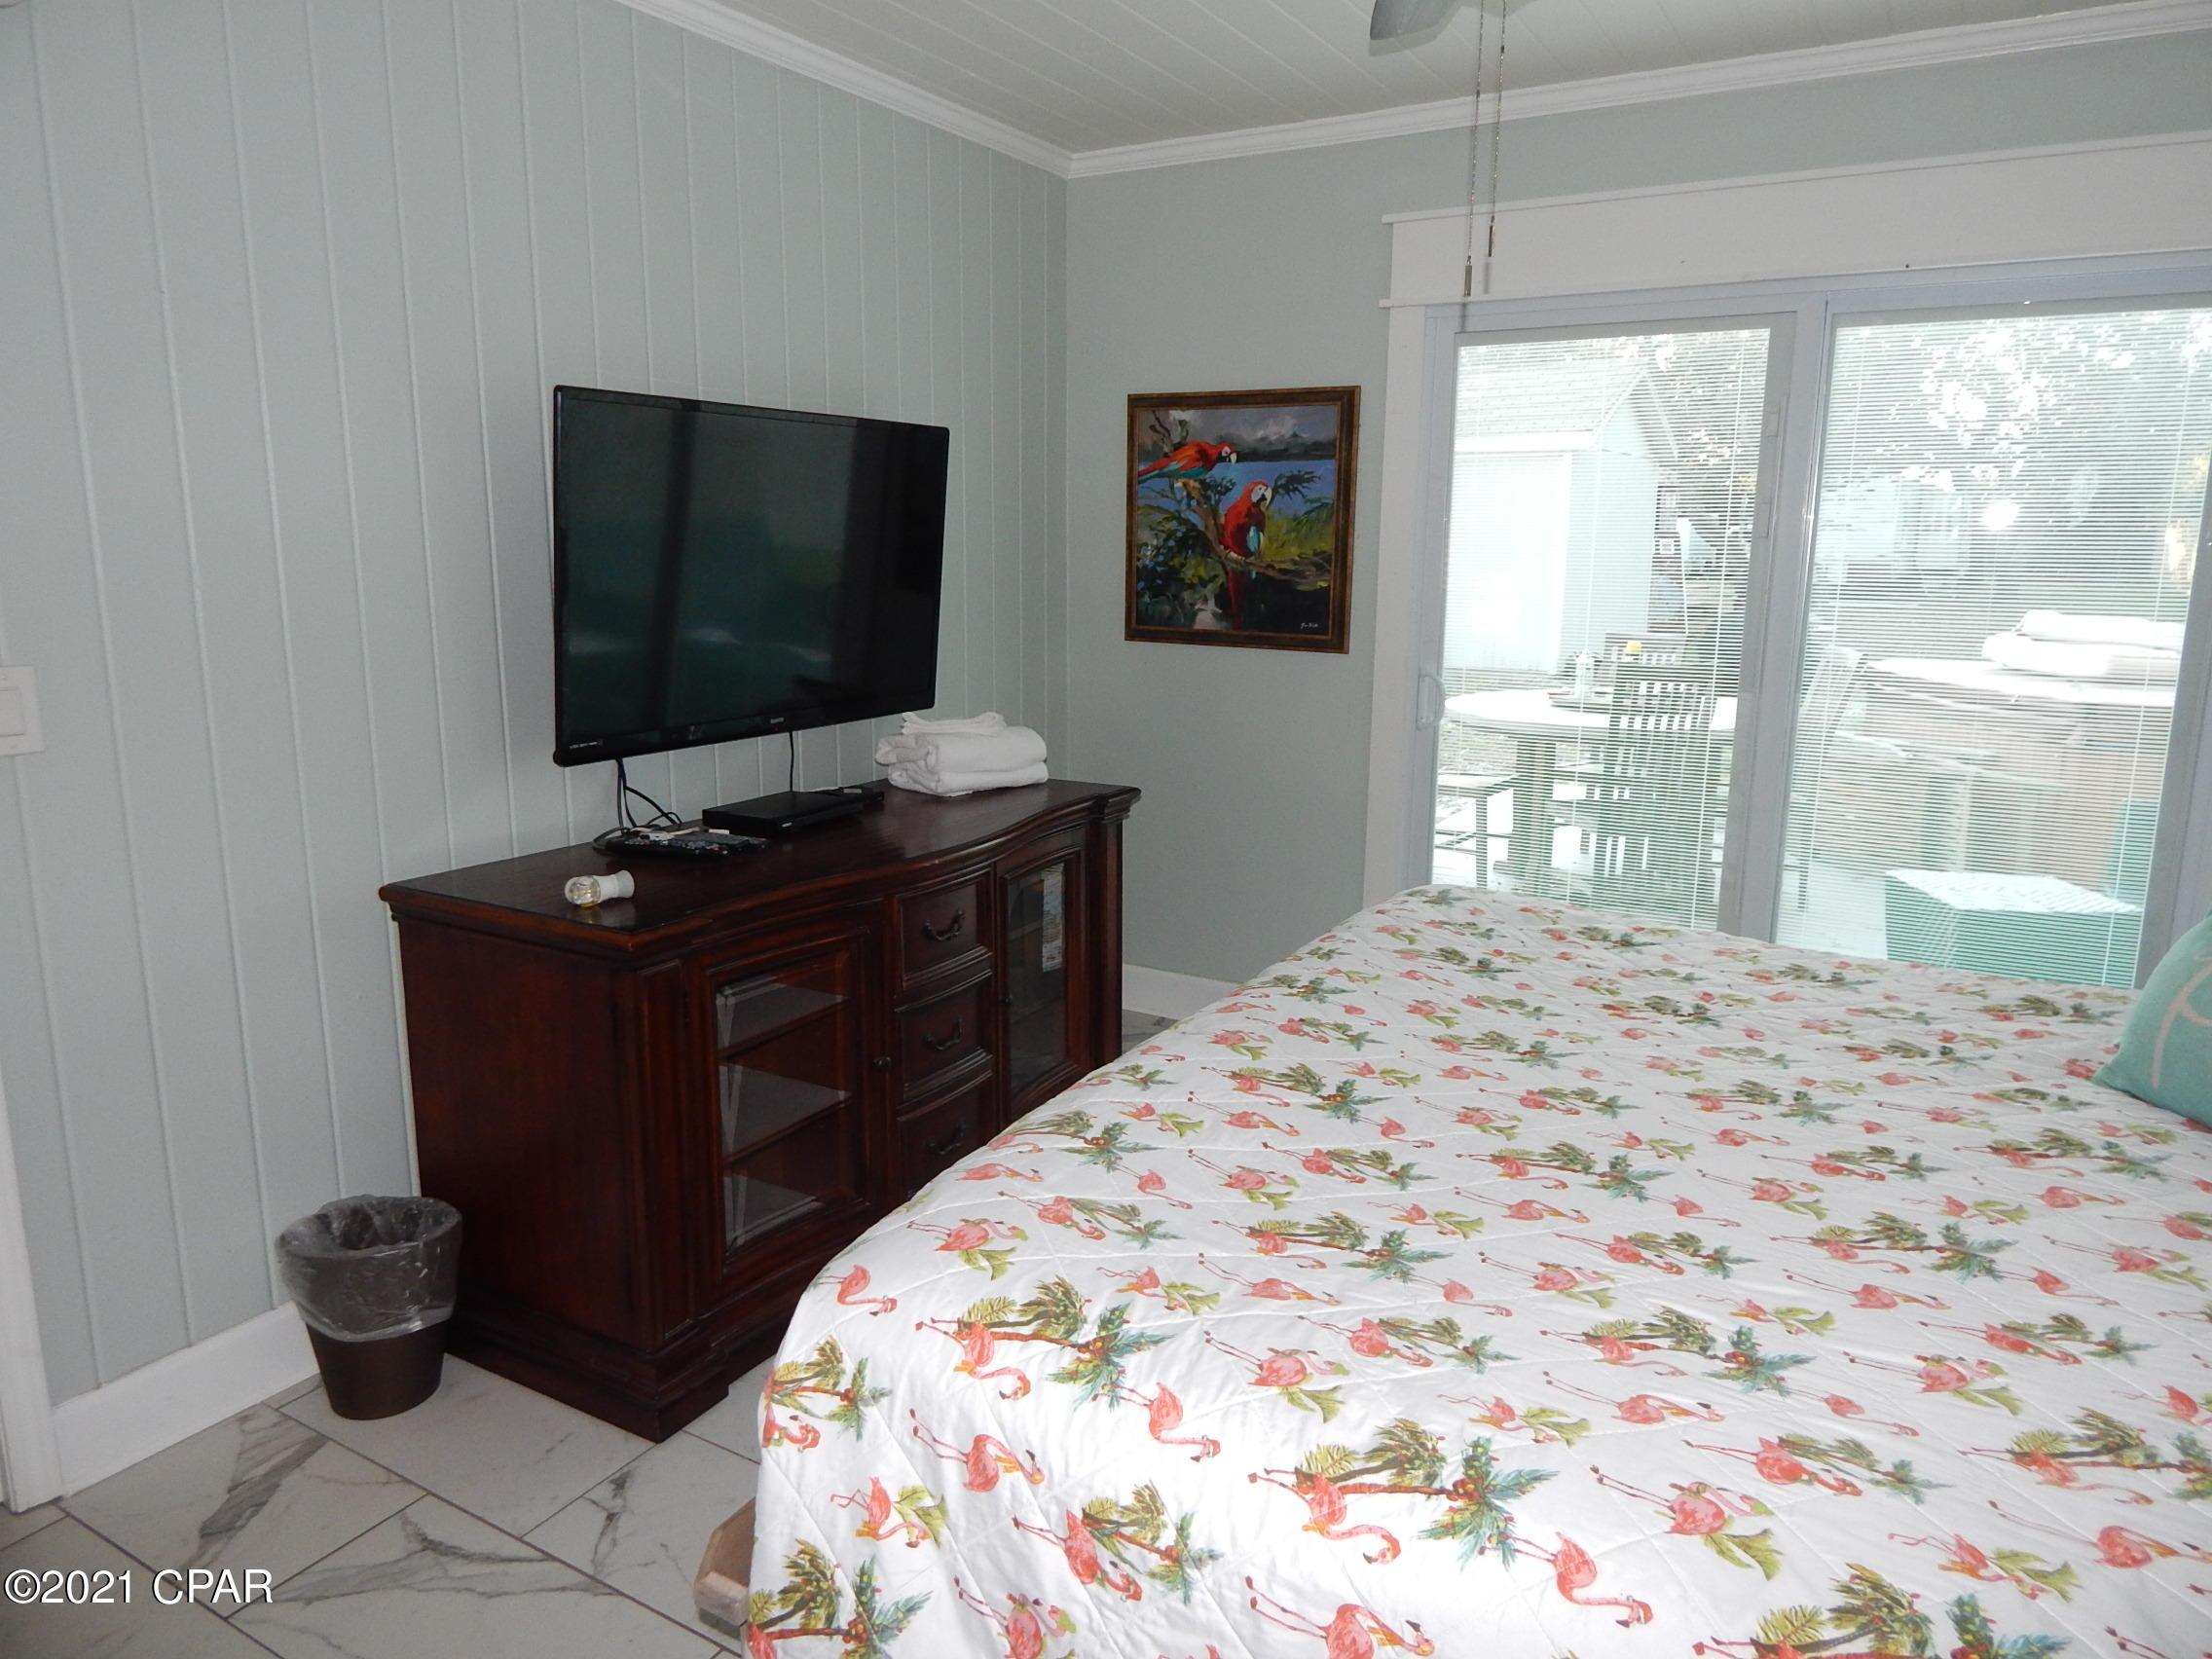 2411 Joan Avenue, Panama City Beach, Florida 32408, 3 Bedrooms Bedrooms, ,1 BathroomBathrooms,Single Family,For Sale,2411 Joan Avenue,706704